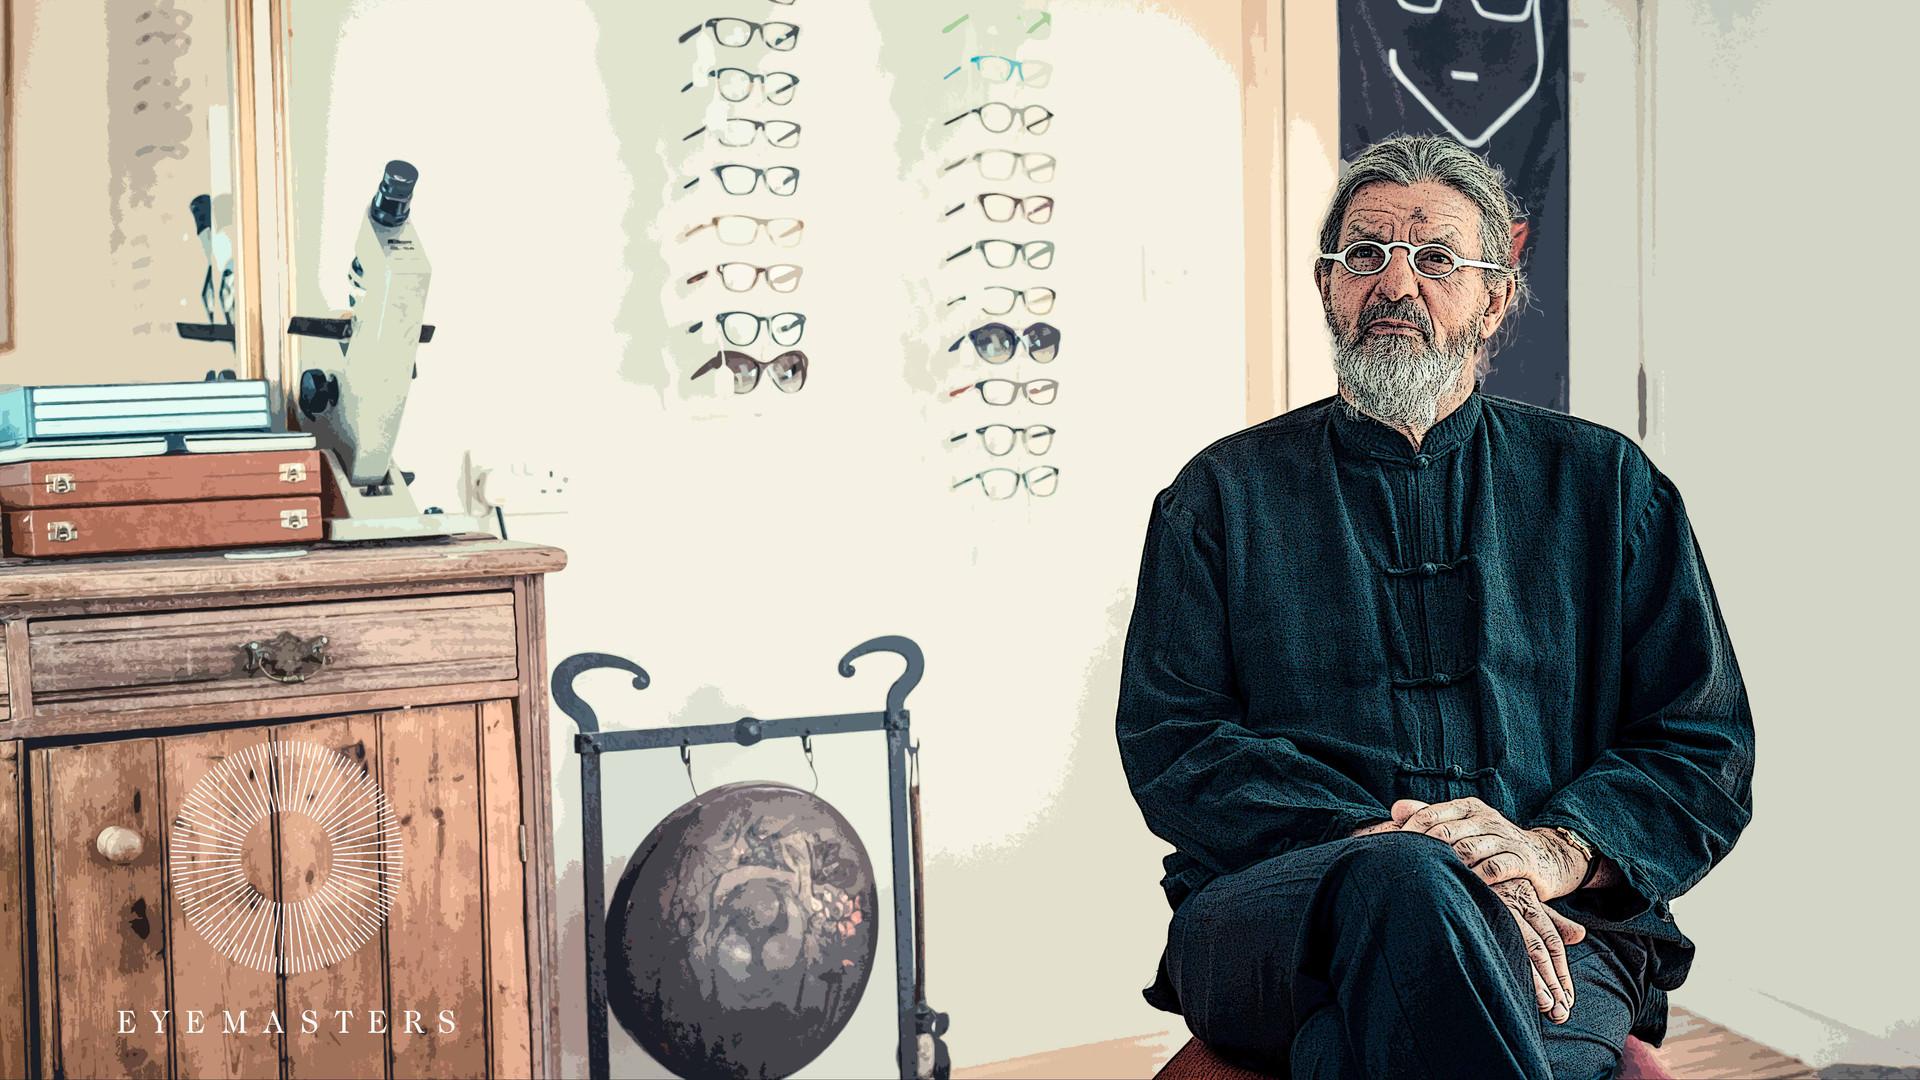 EyeMasters Promo Video